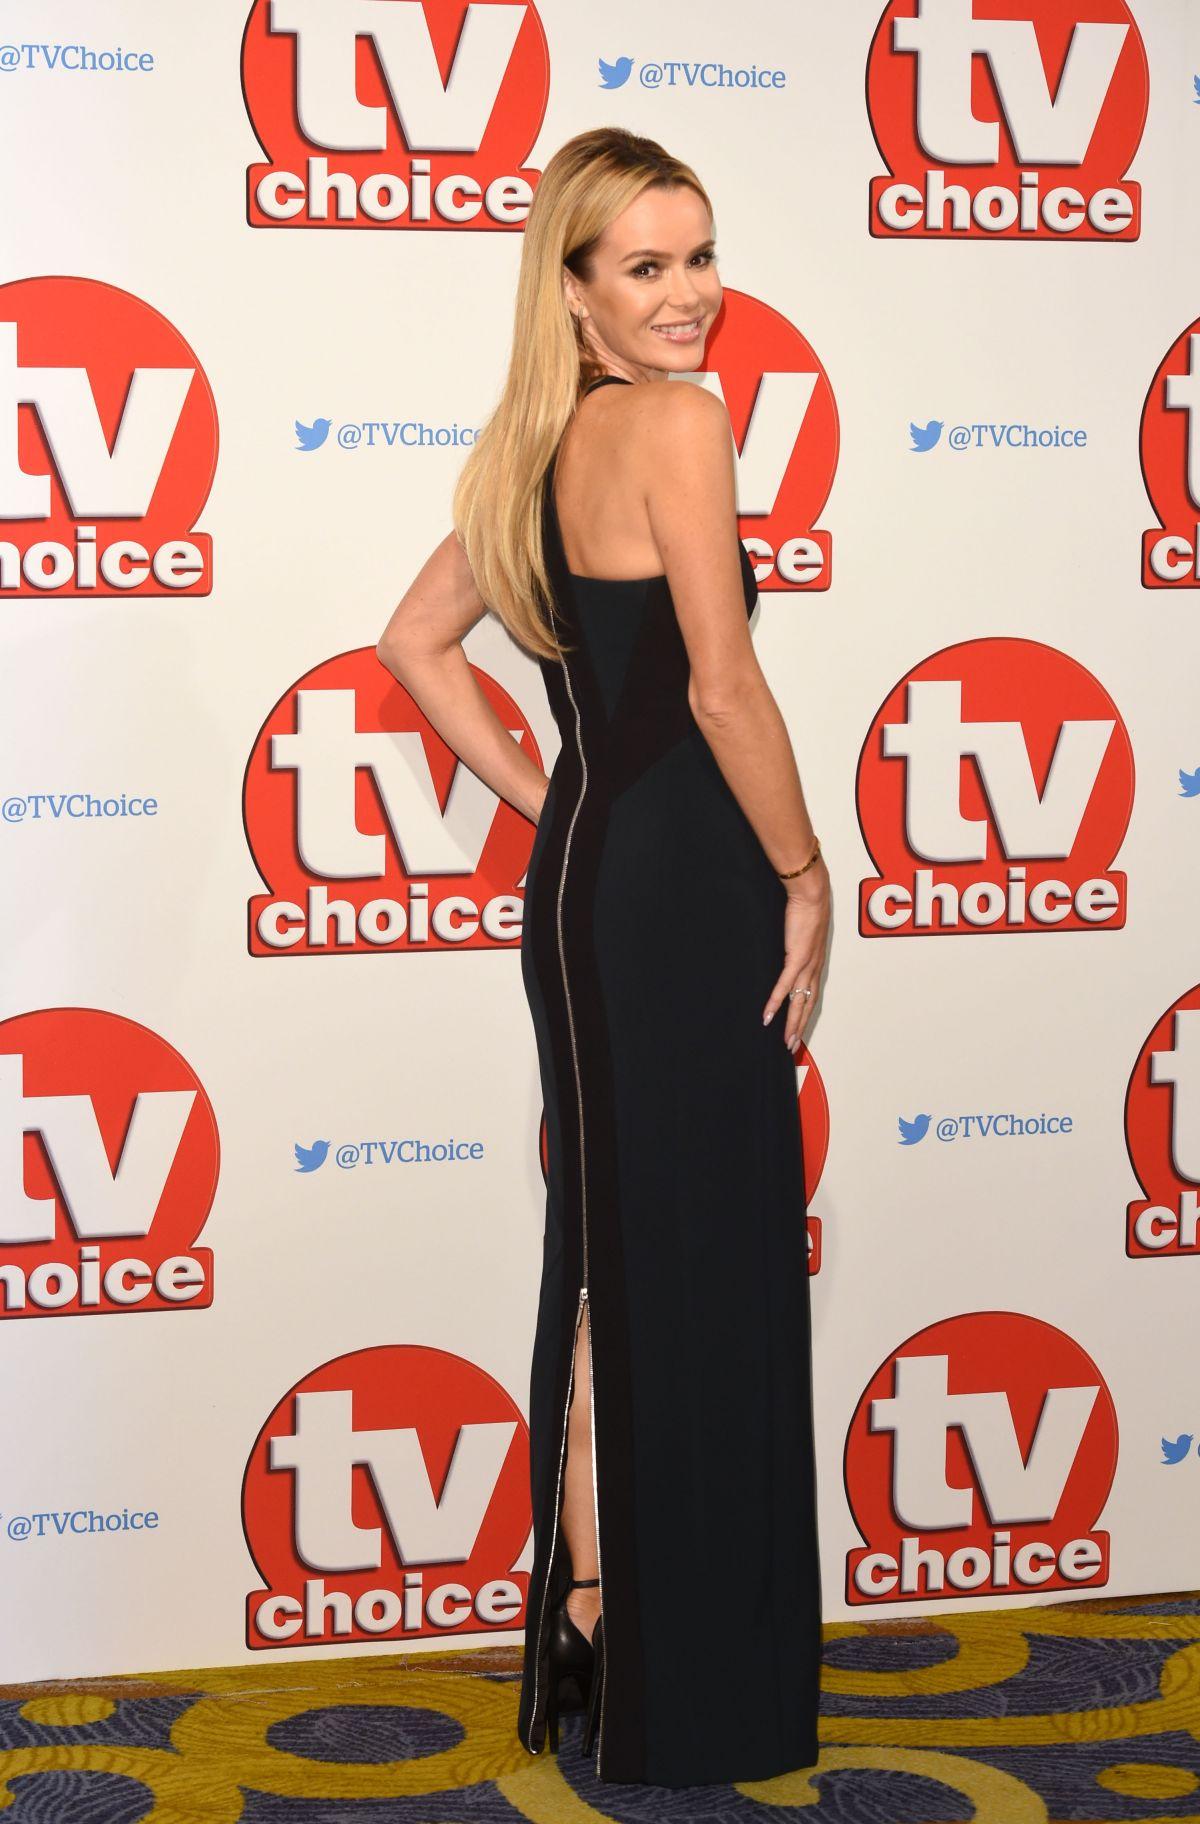 AMANDA HOLDEN at TV Choice Awards 2015 in London